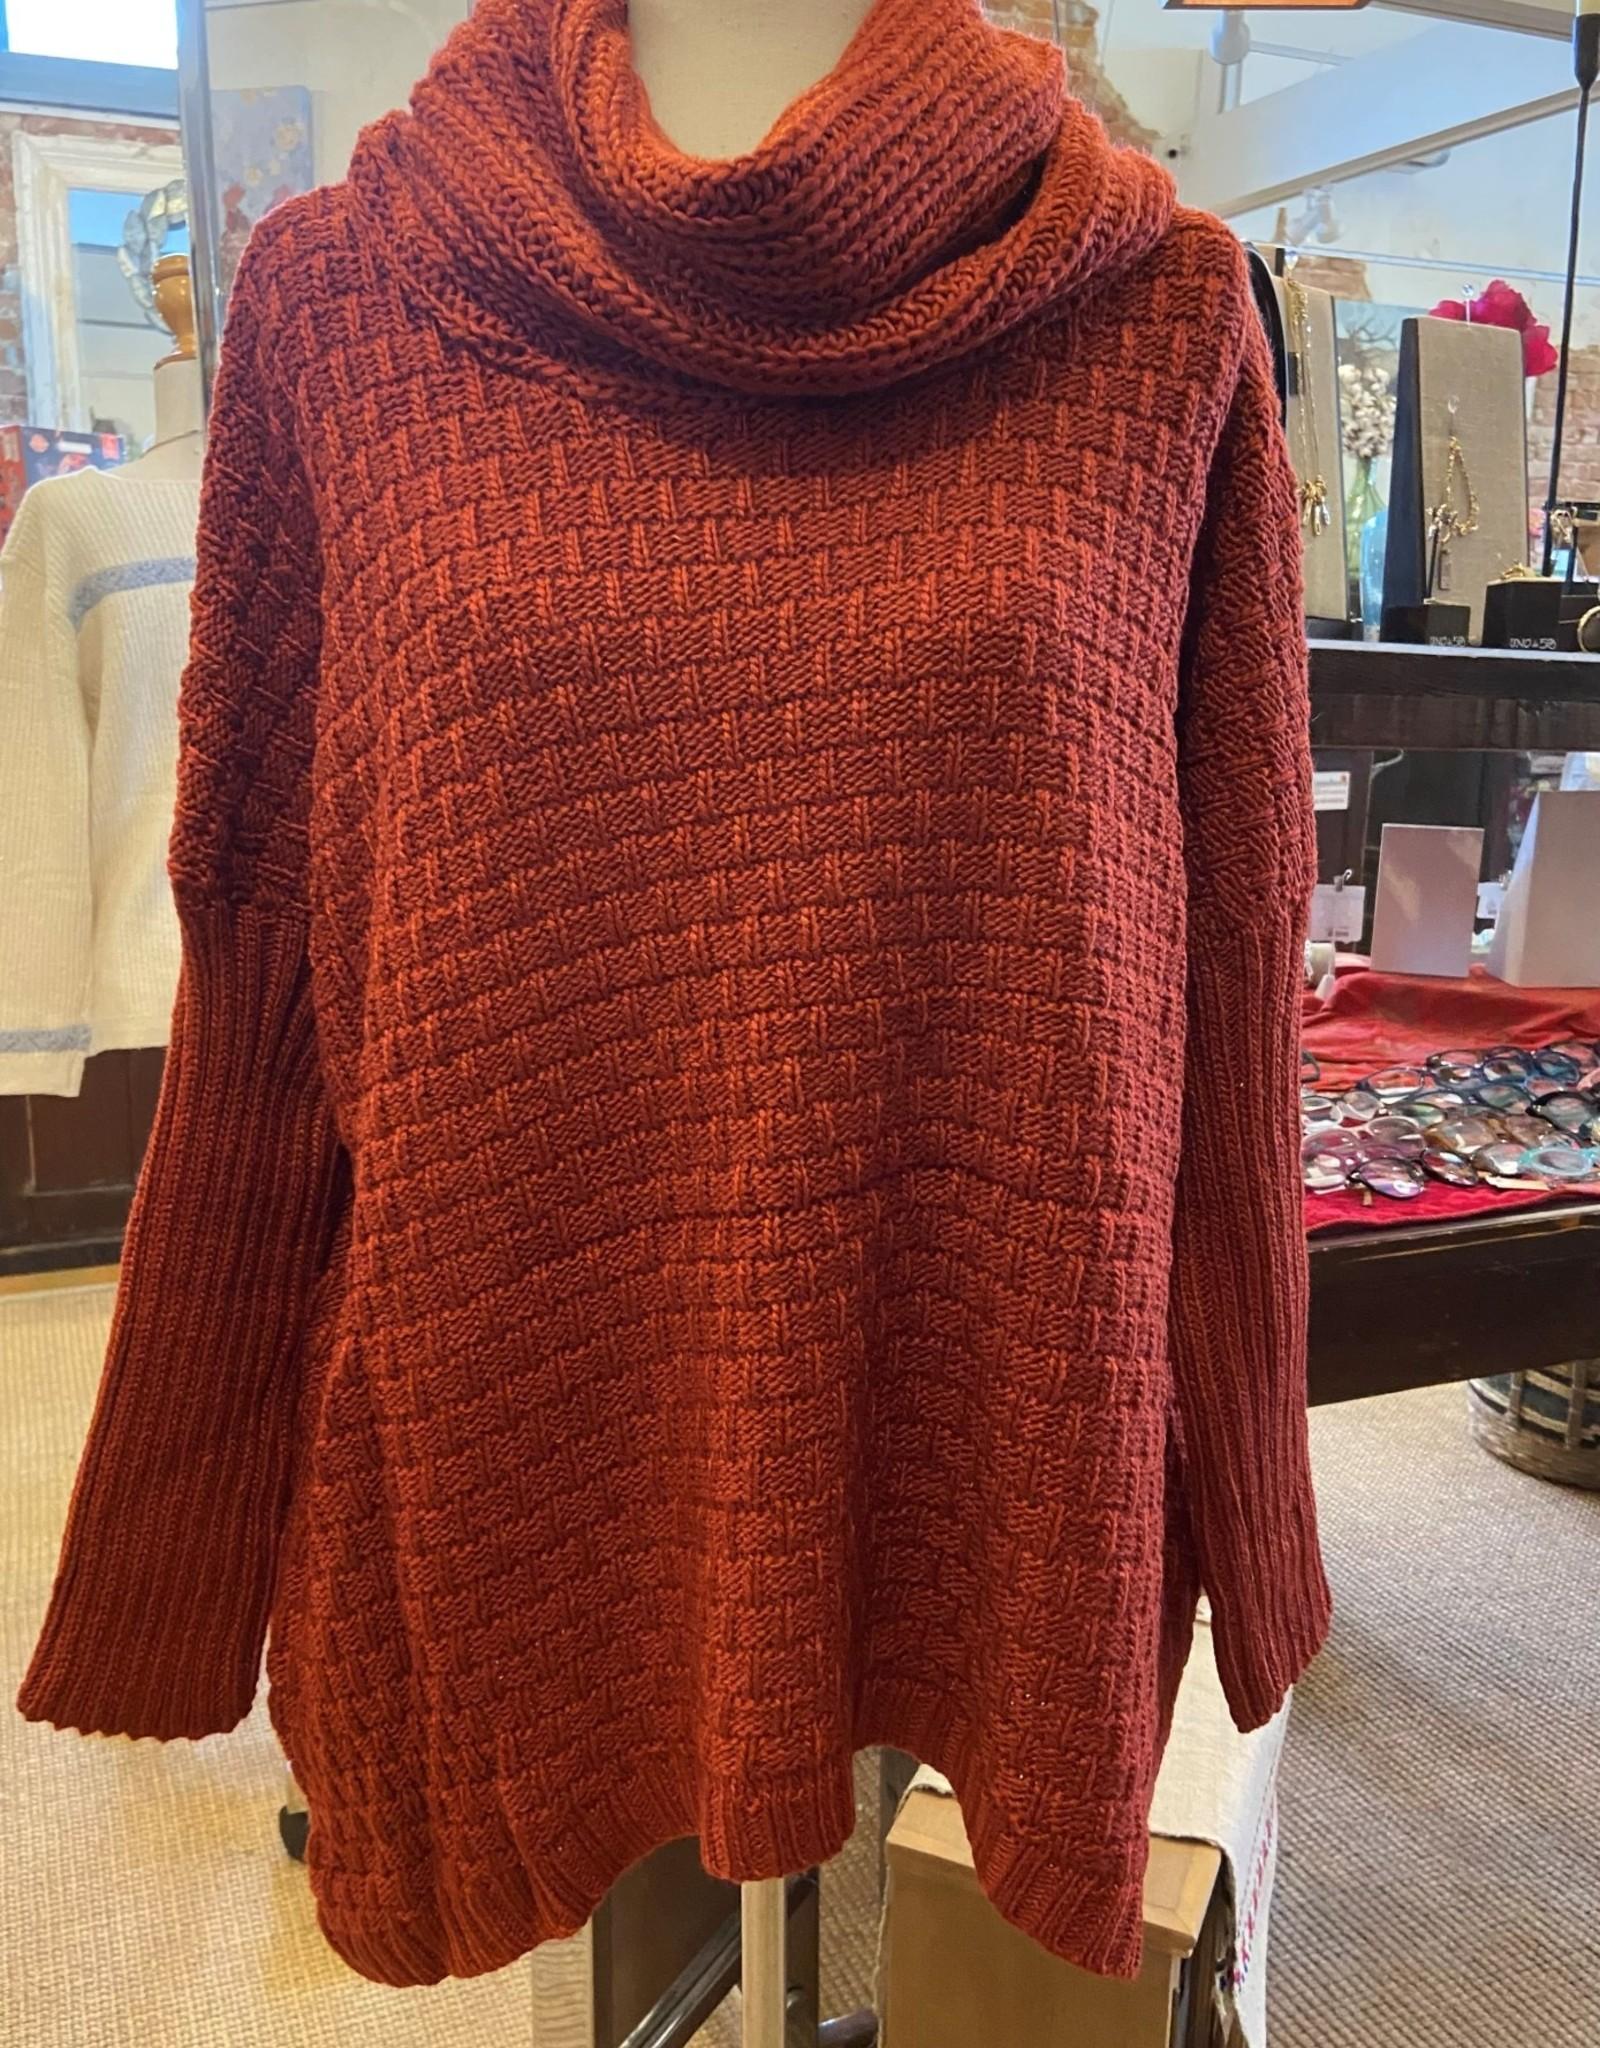 Orange Fashion Village Cowl Neck Basket Knit Sweater